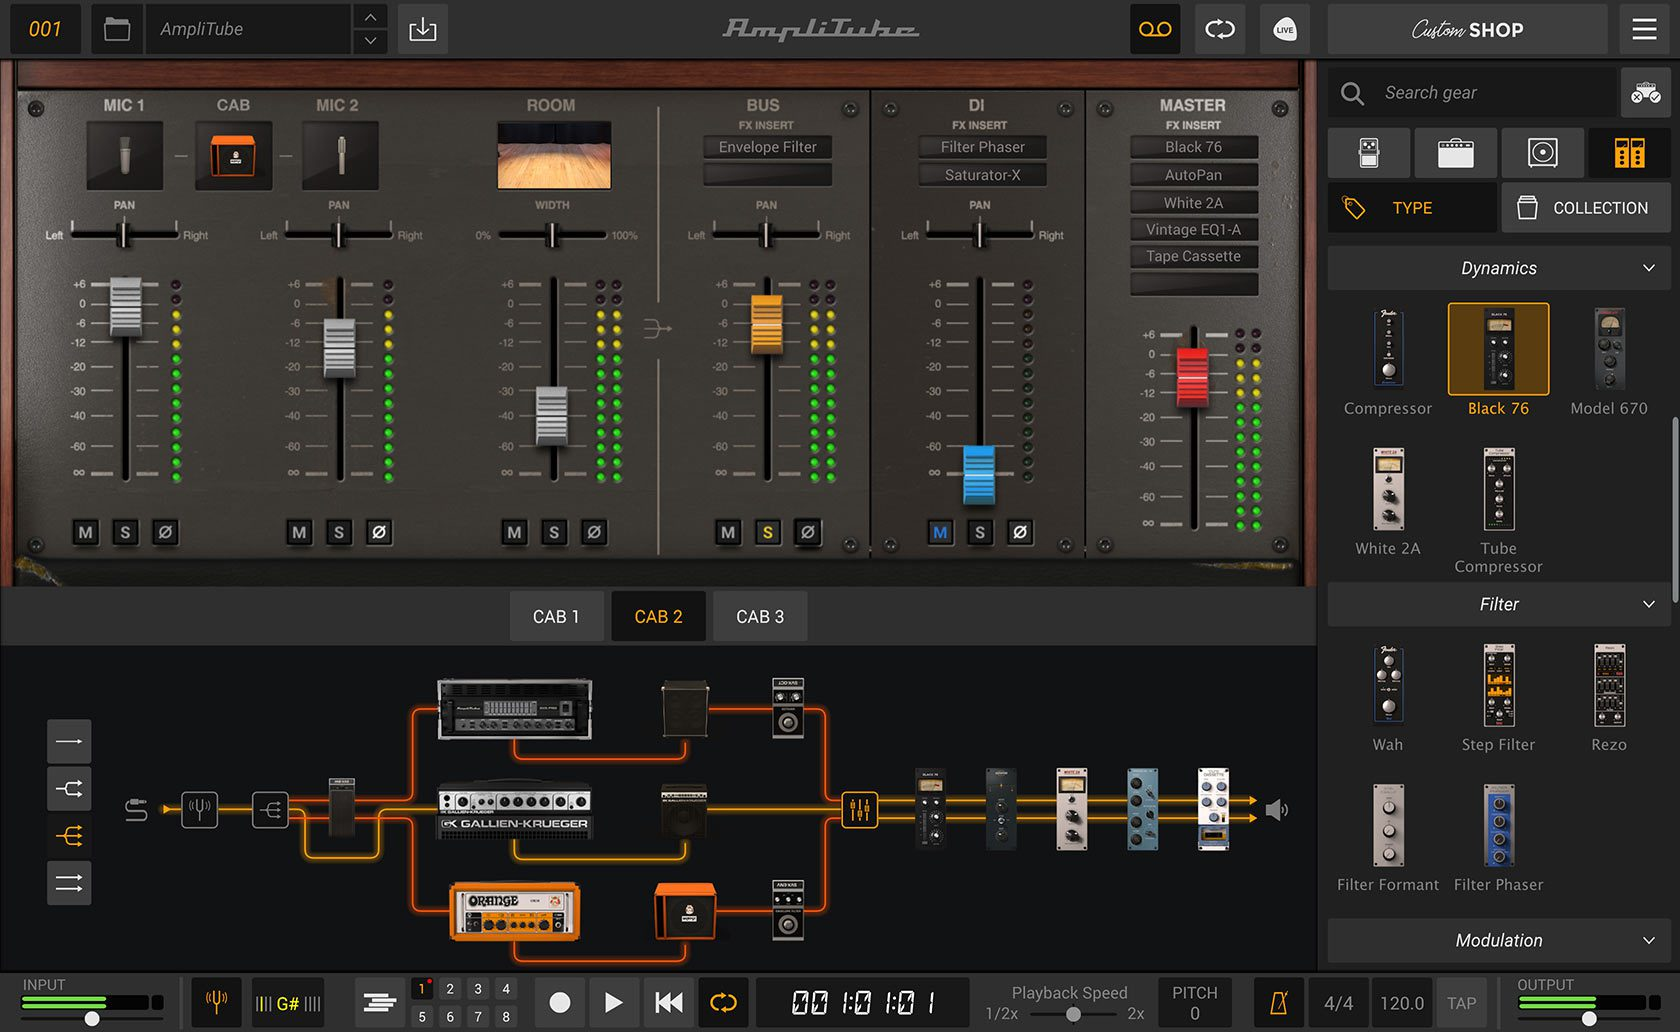 IK Multimedia Amplitube 5 Mixer